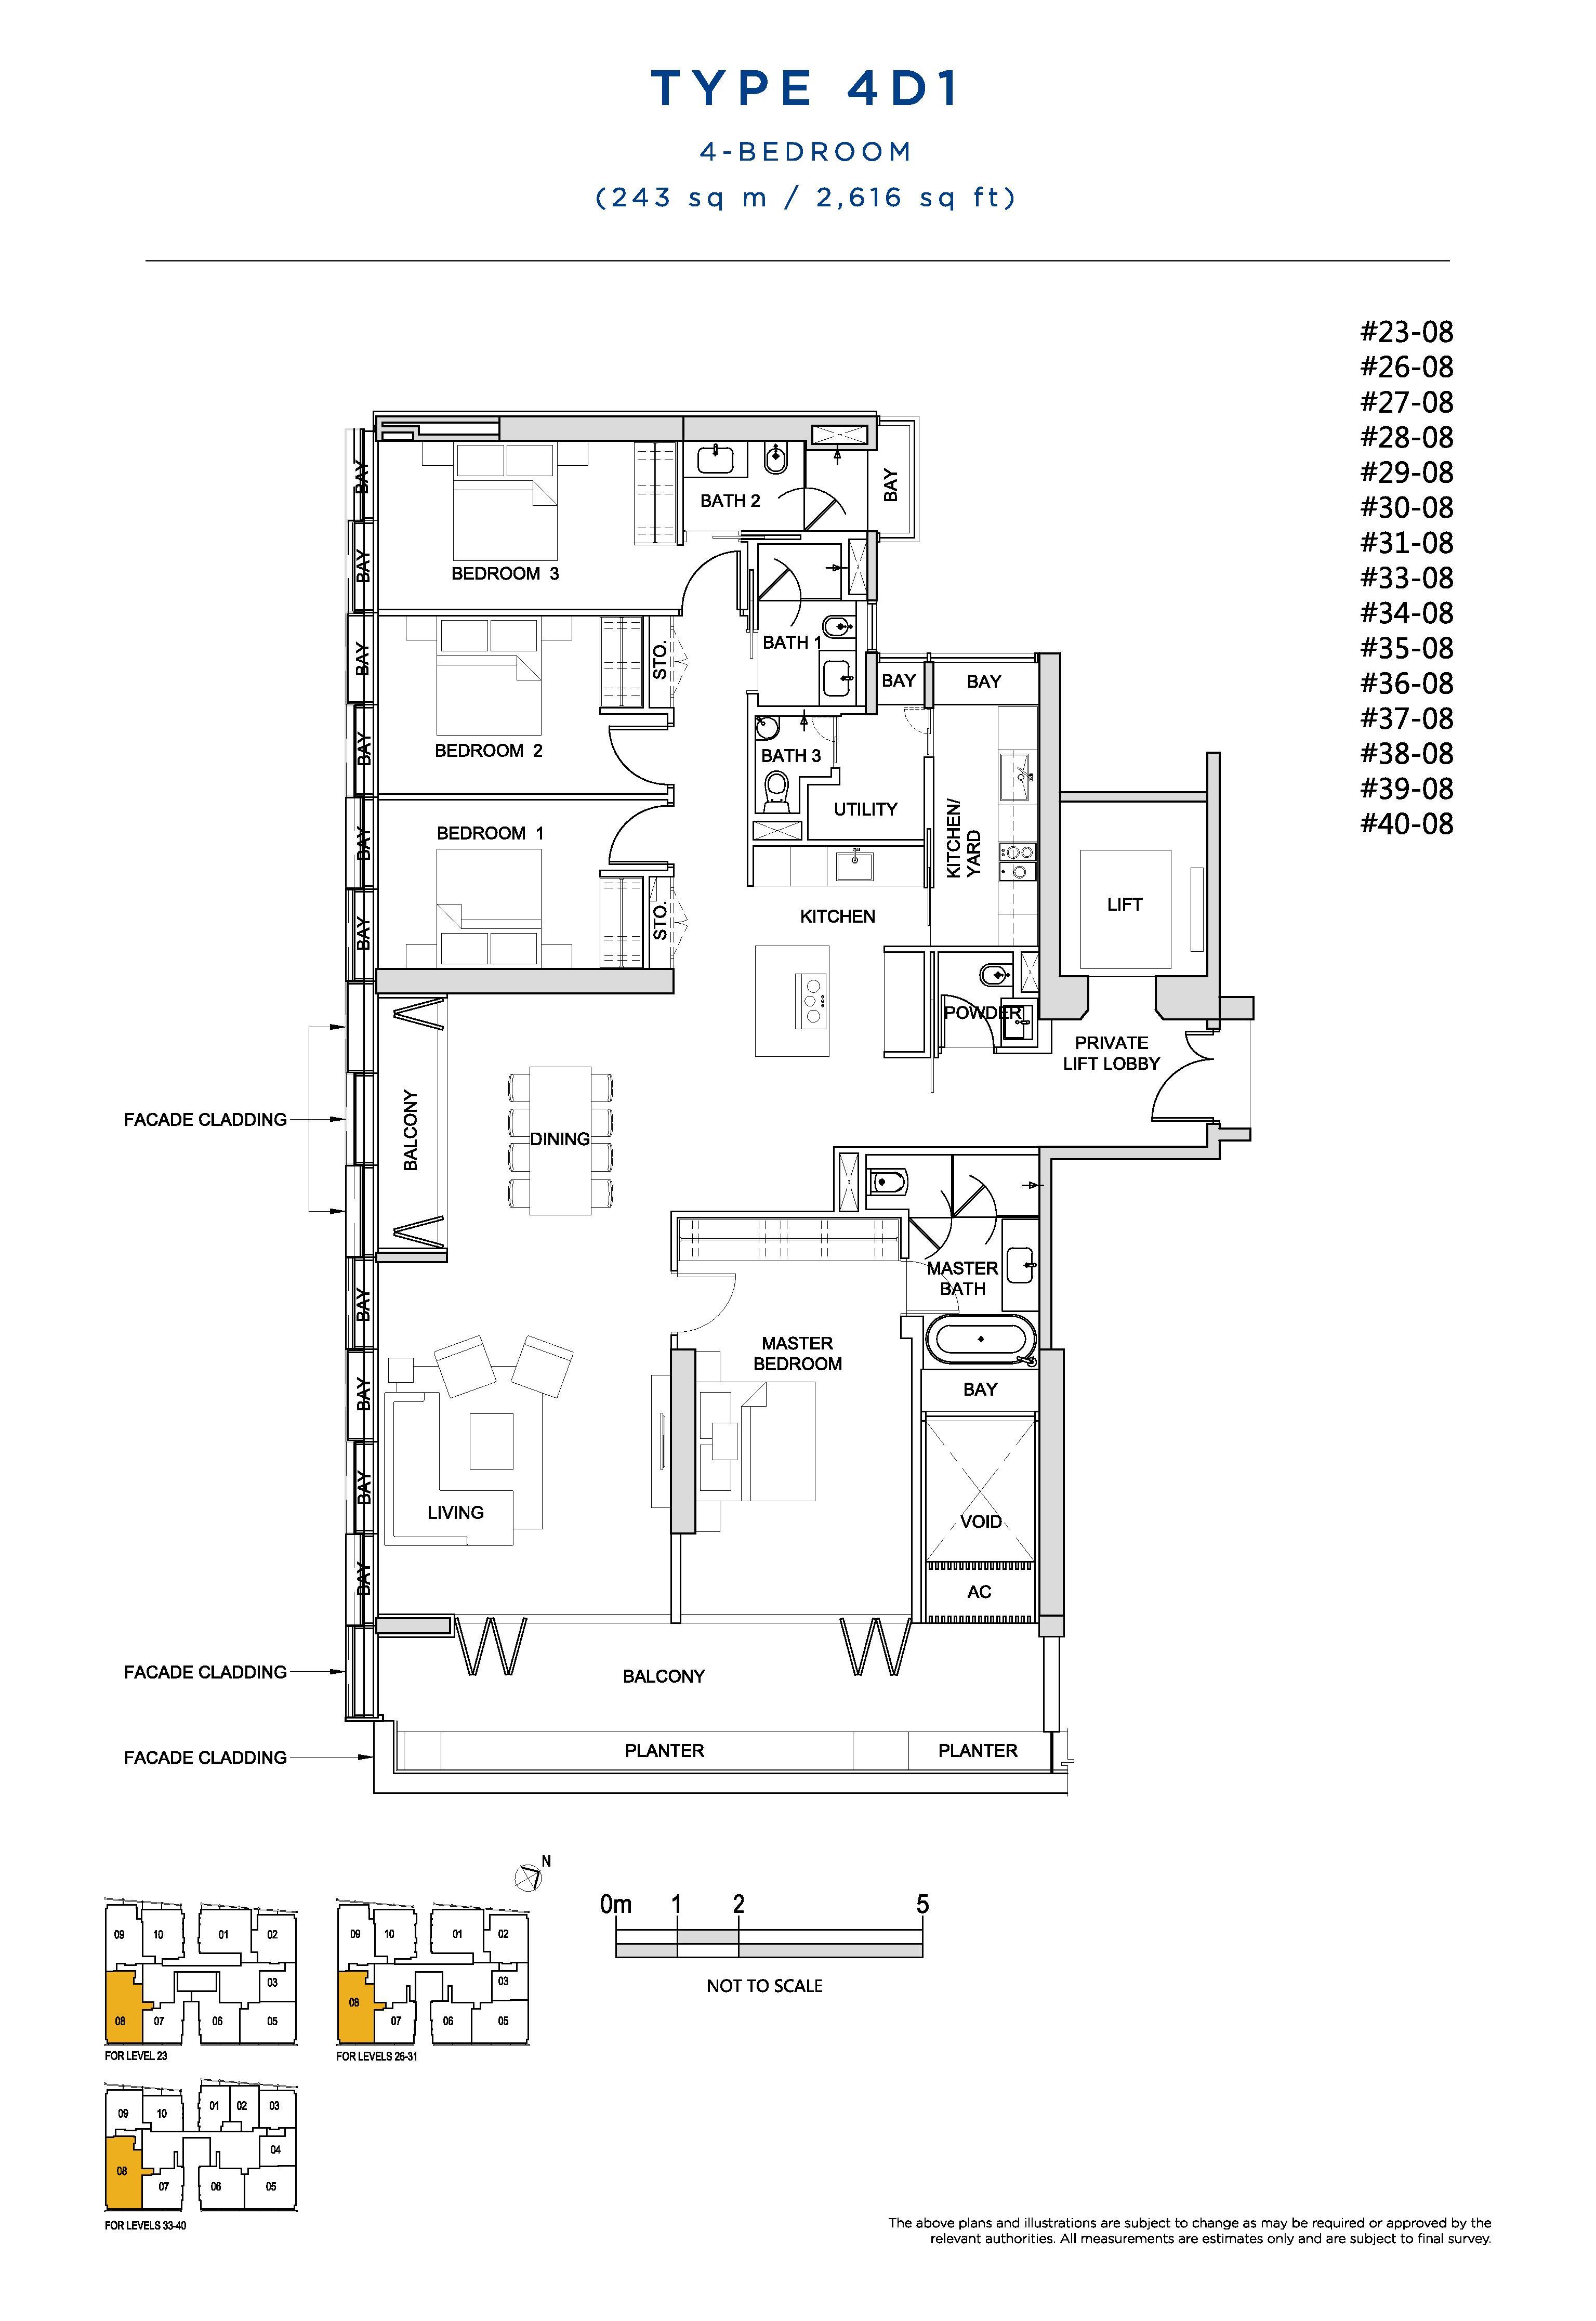 South Beach Residences 4 Bedroom Floor Plans Type 4D1